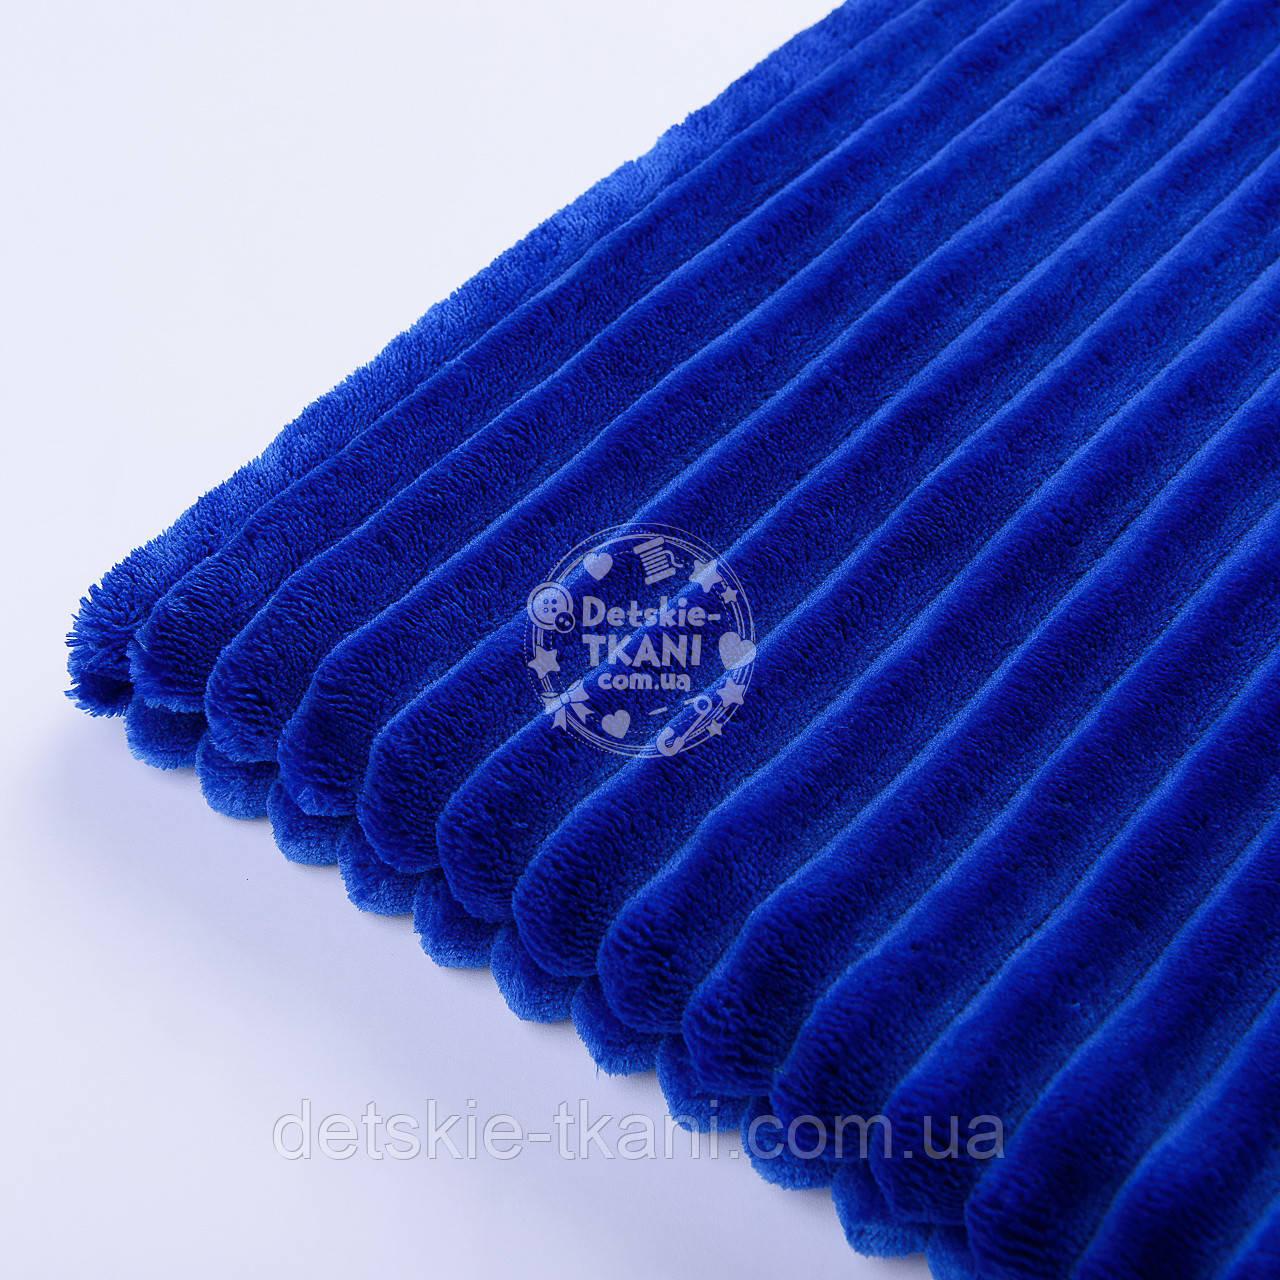 Отрез плюш в полоску Stripes синего цвета размер 100*80